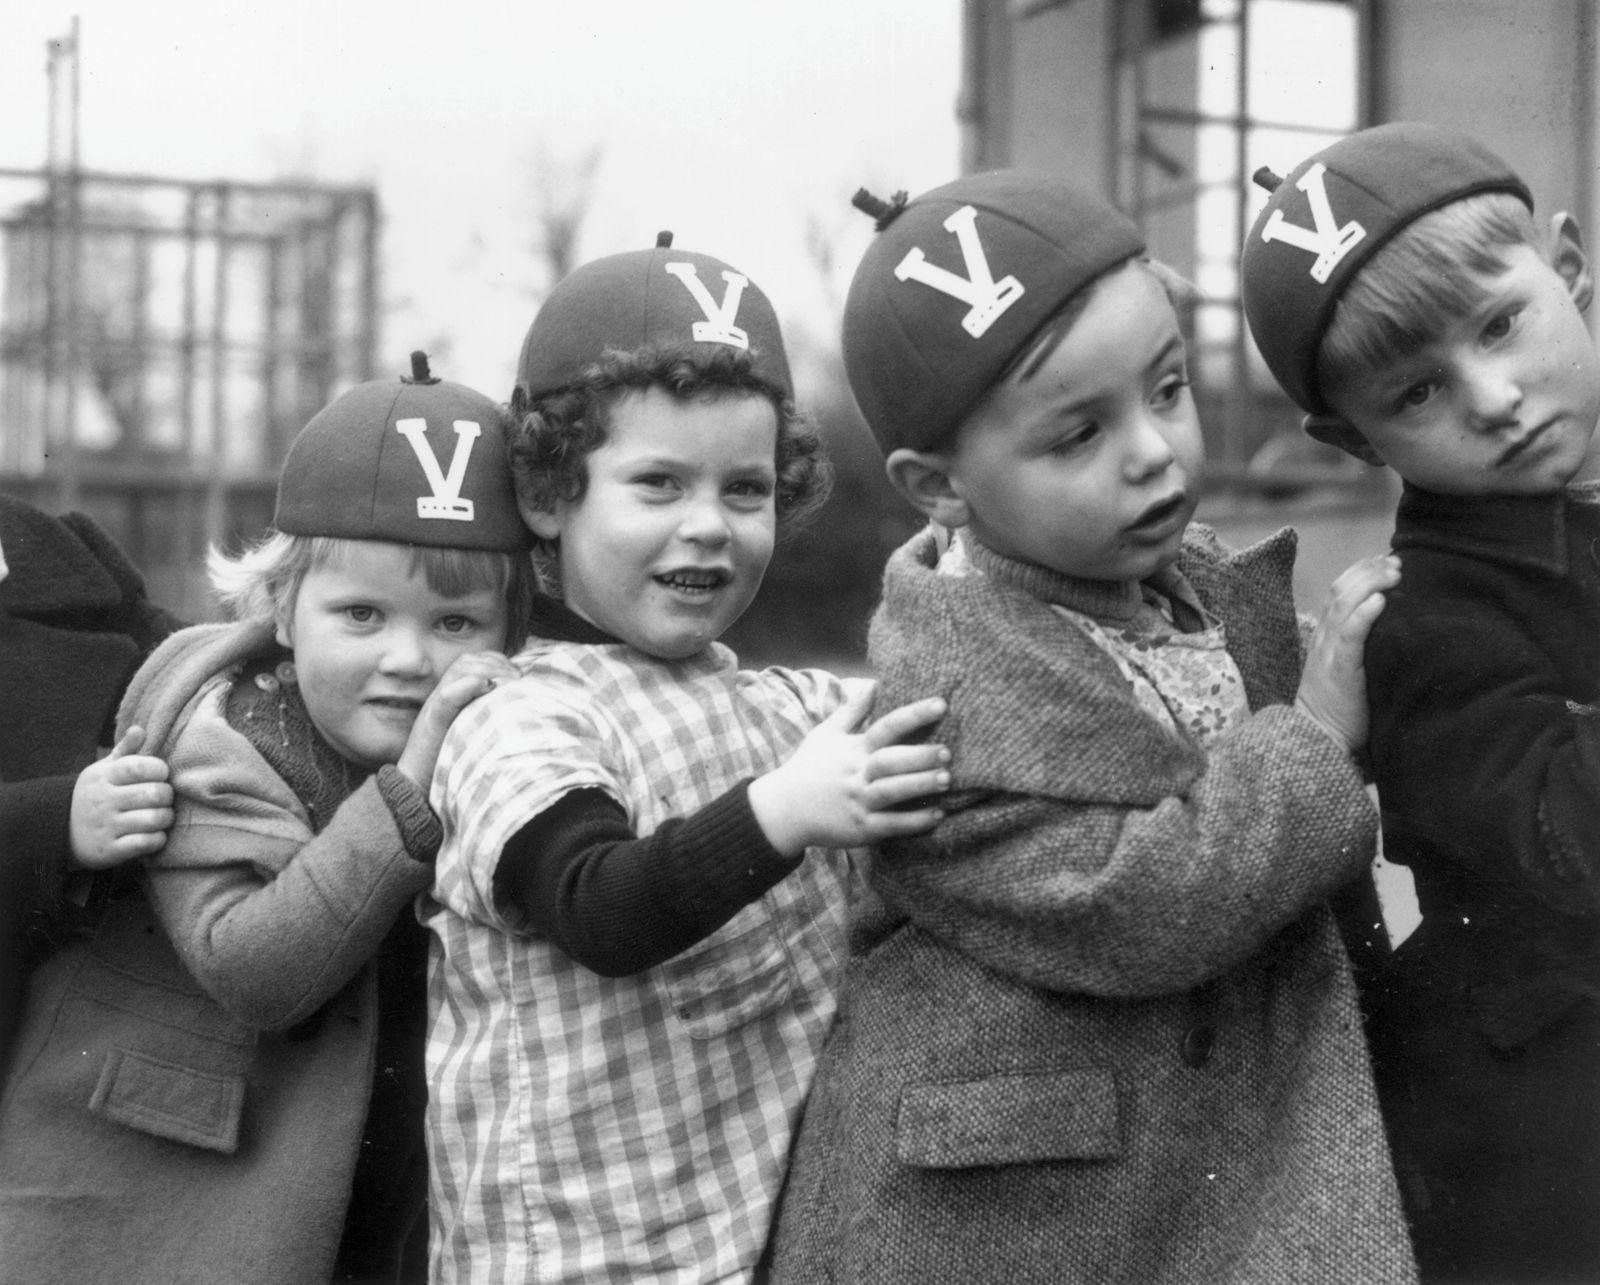 Victory V Caps